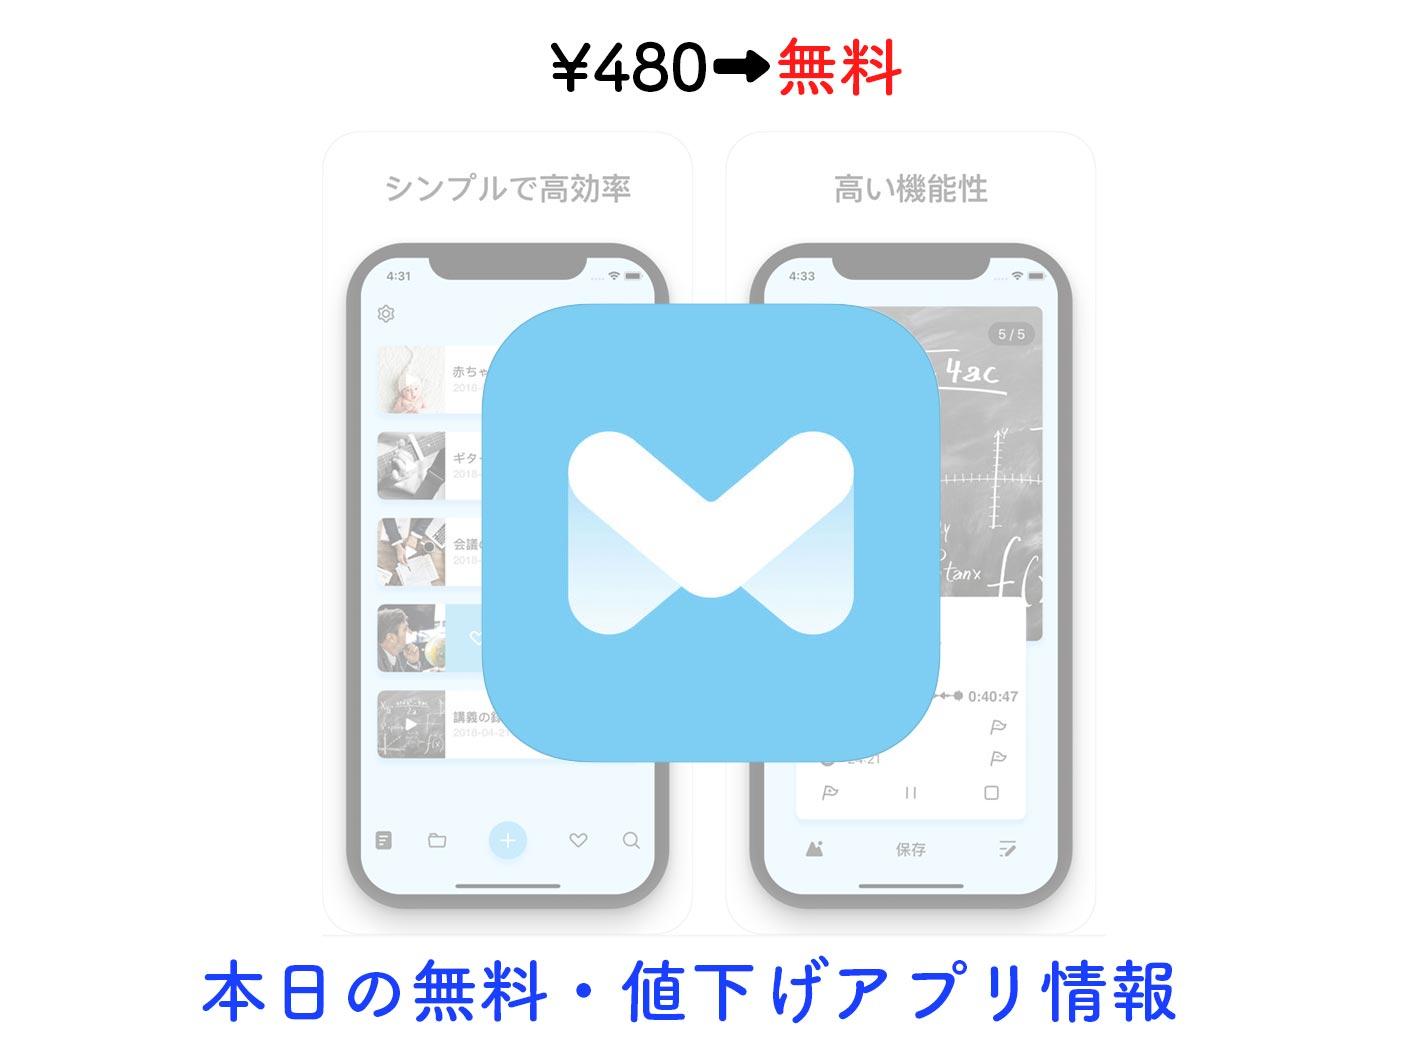 Appsale0814